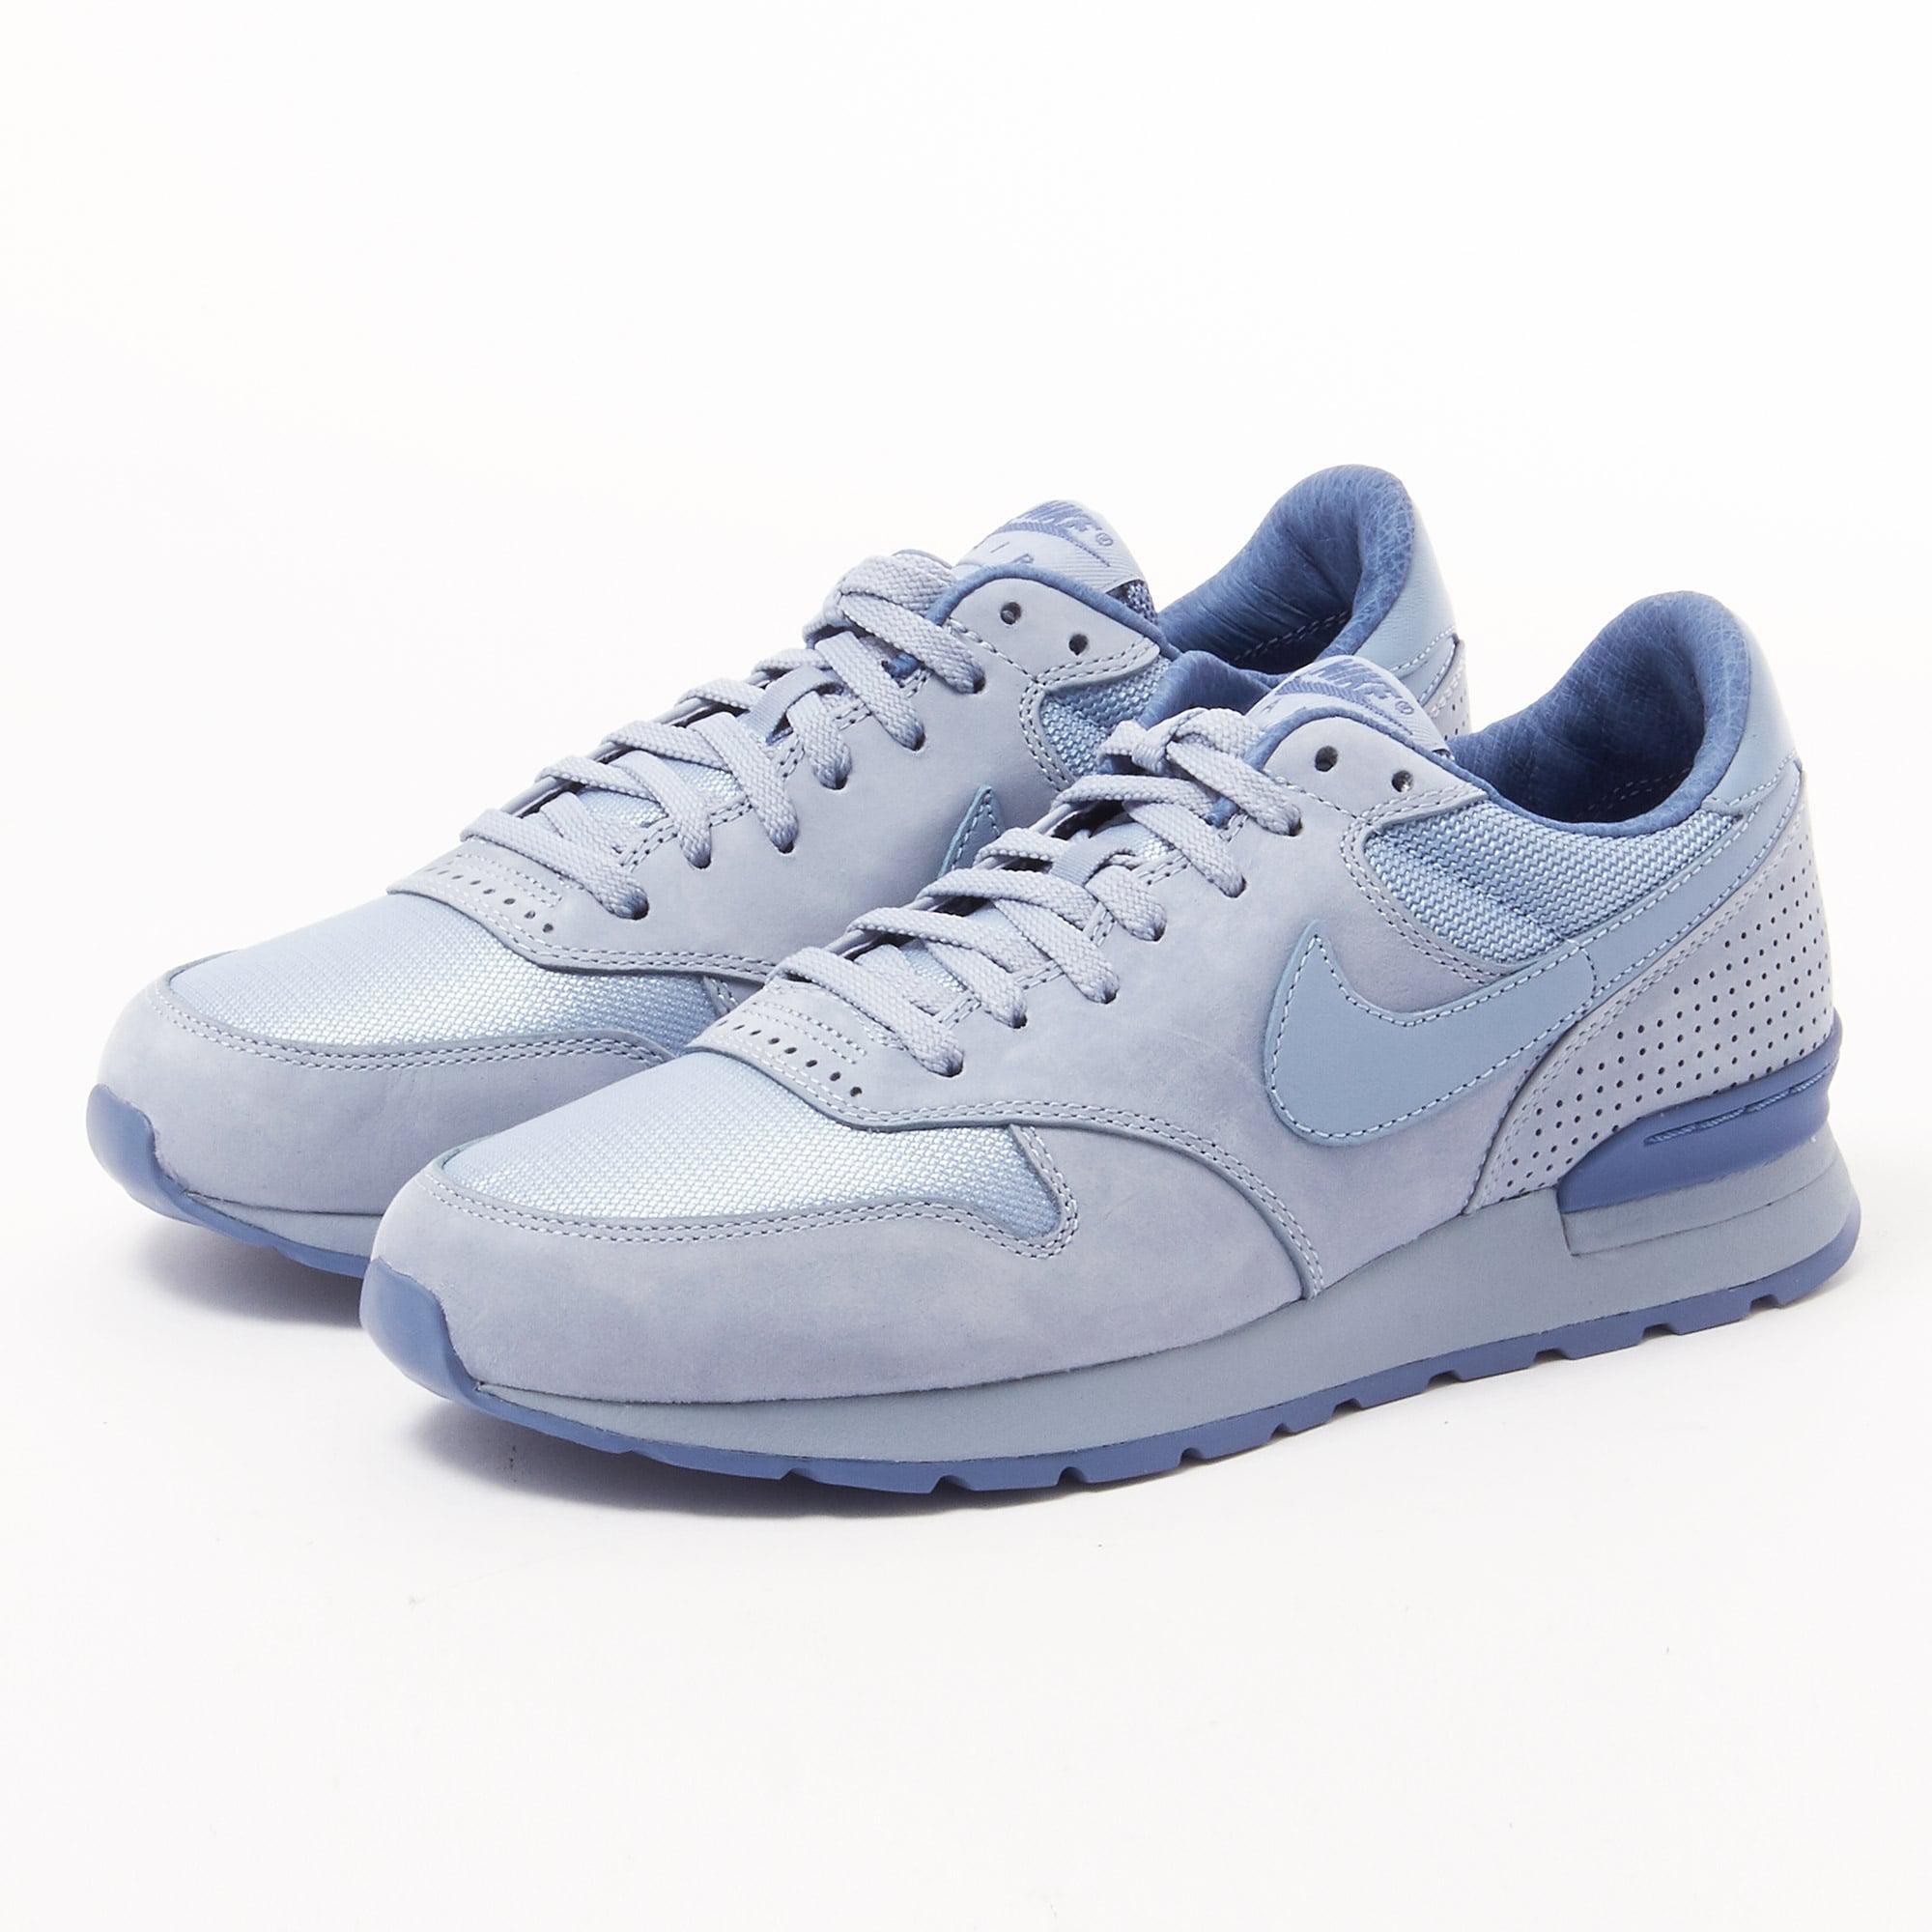 Nike Air Zoom Épique Luxe Bas-tops Et Chaussures De Sport YdZPJXX6